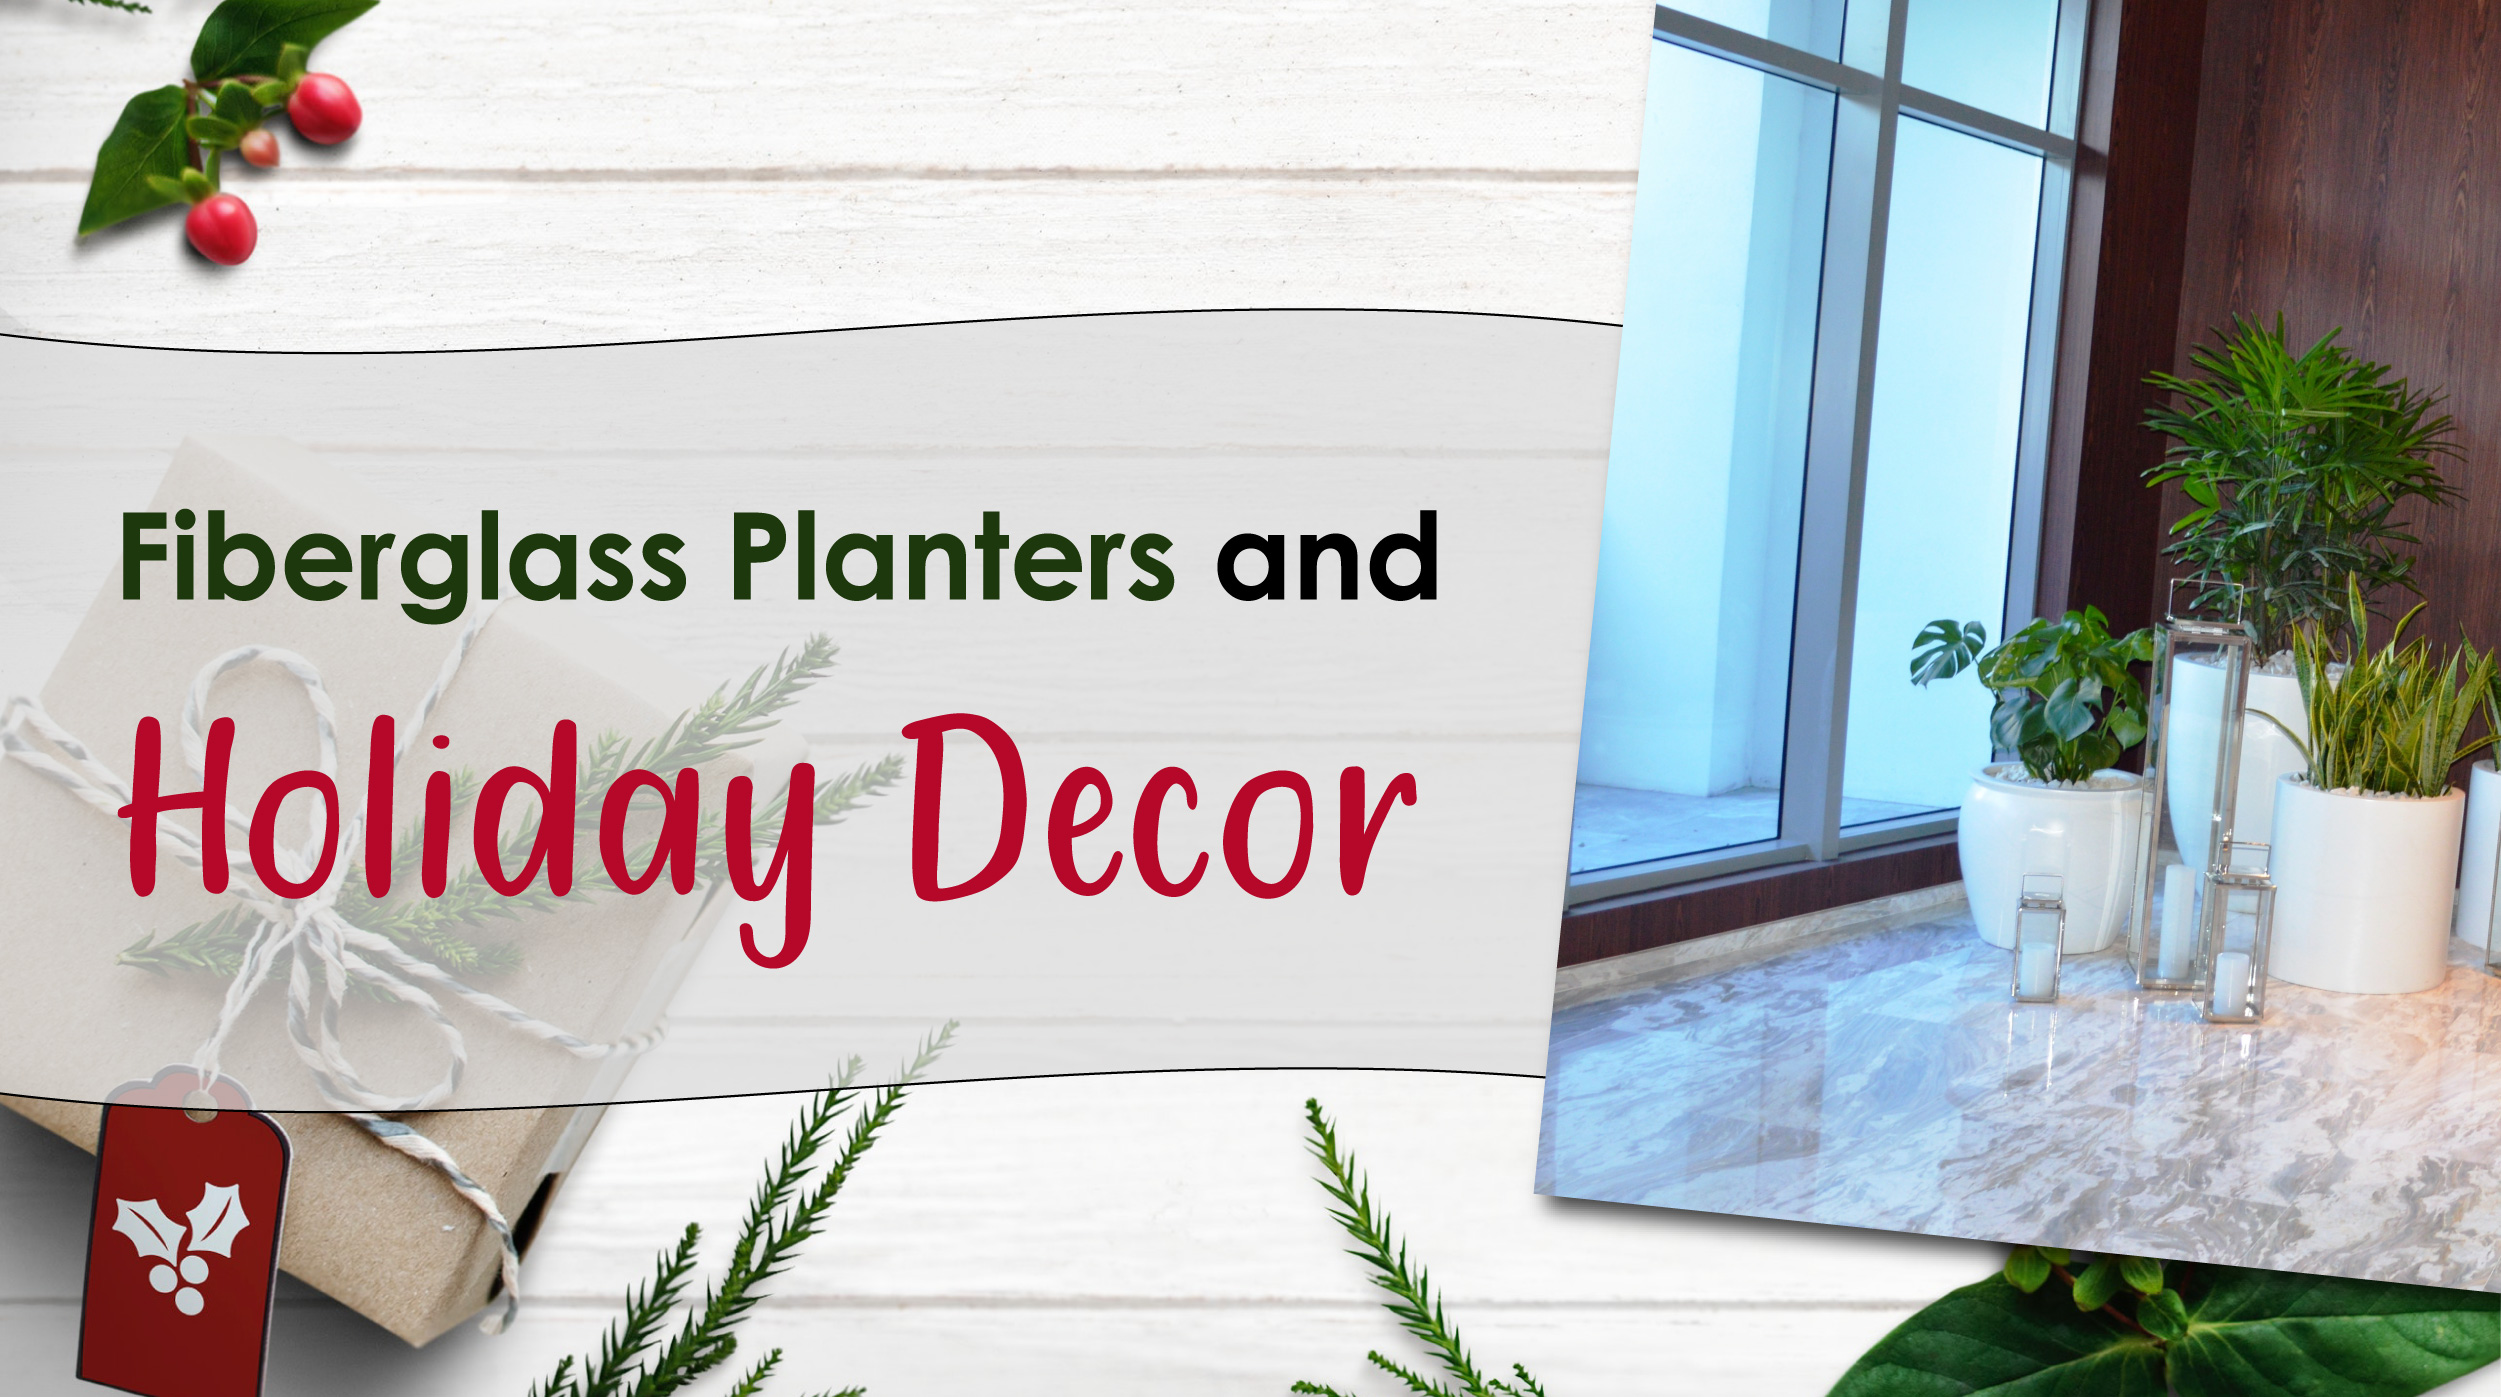 Fiberglass Planters and Holiday Decor